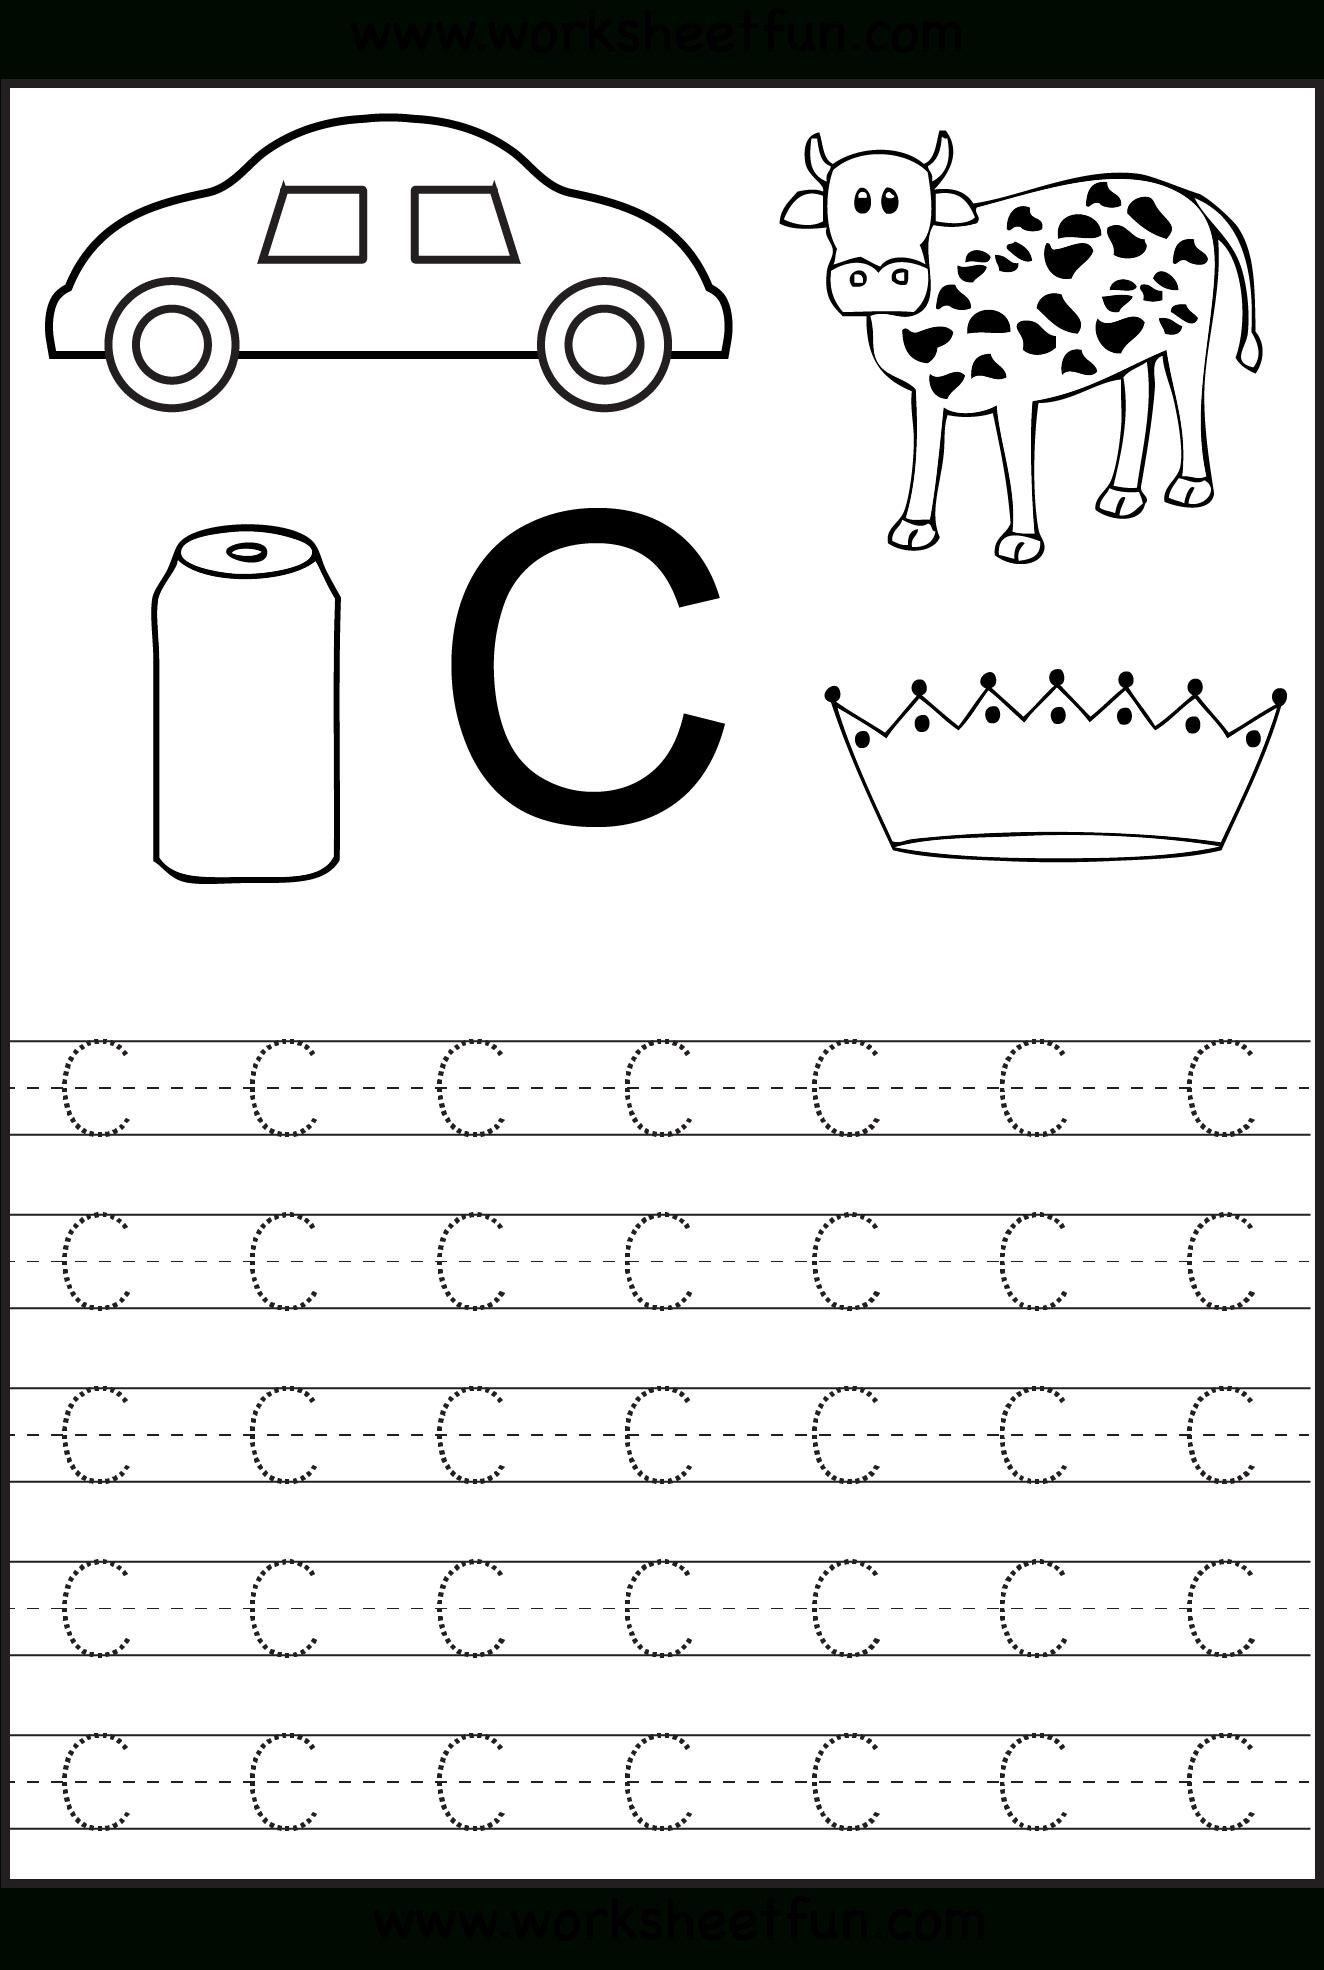 Learning The Letter C   Worksheet   Education in Letter C Worksheets For Nursery